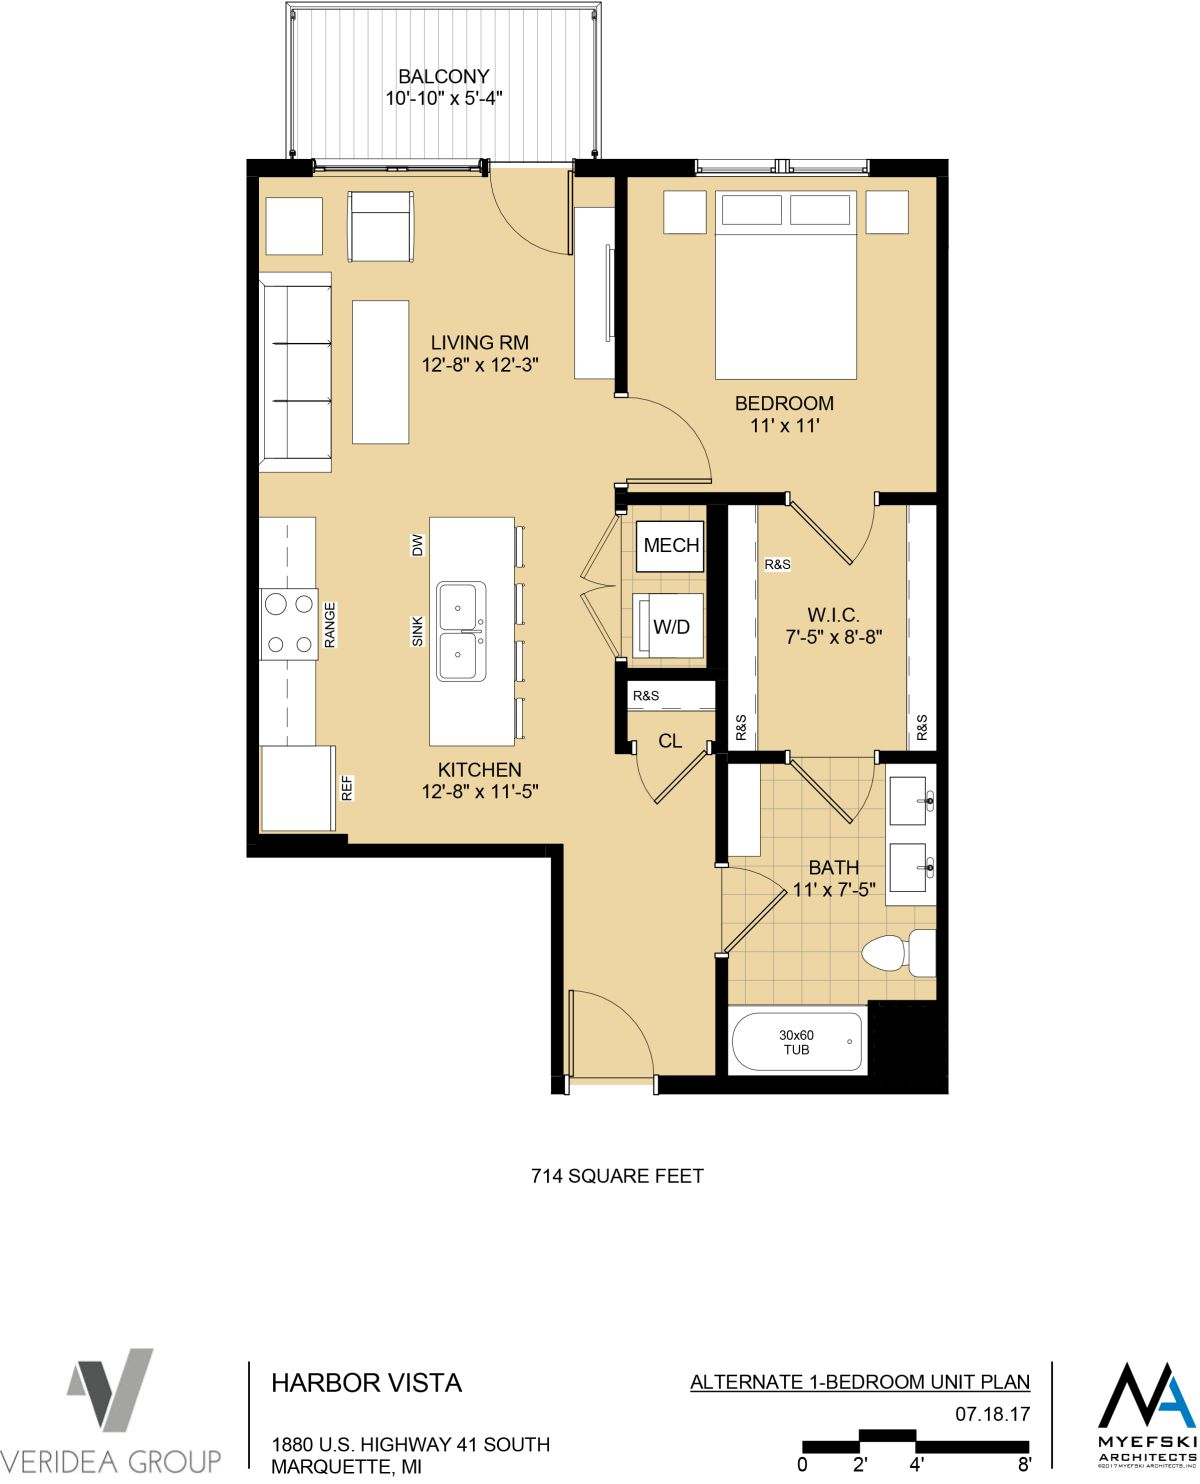 Alternate 1 Bedroom - 714 sq ft